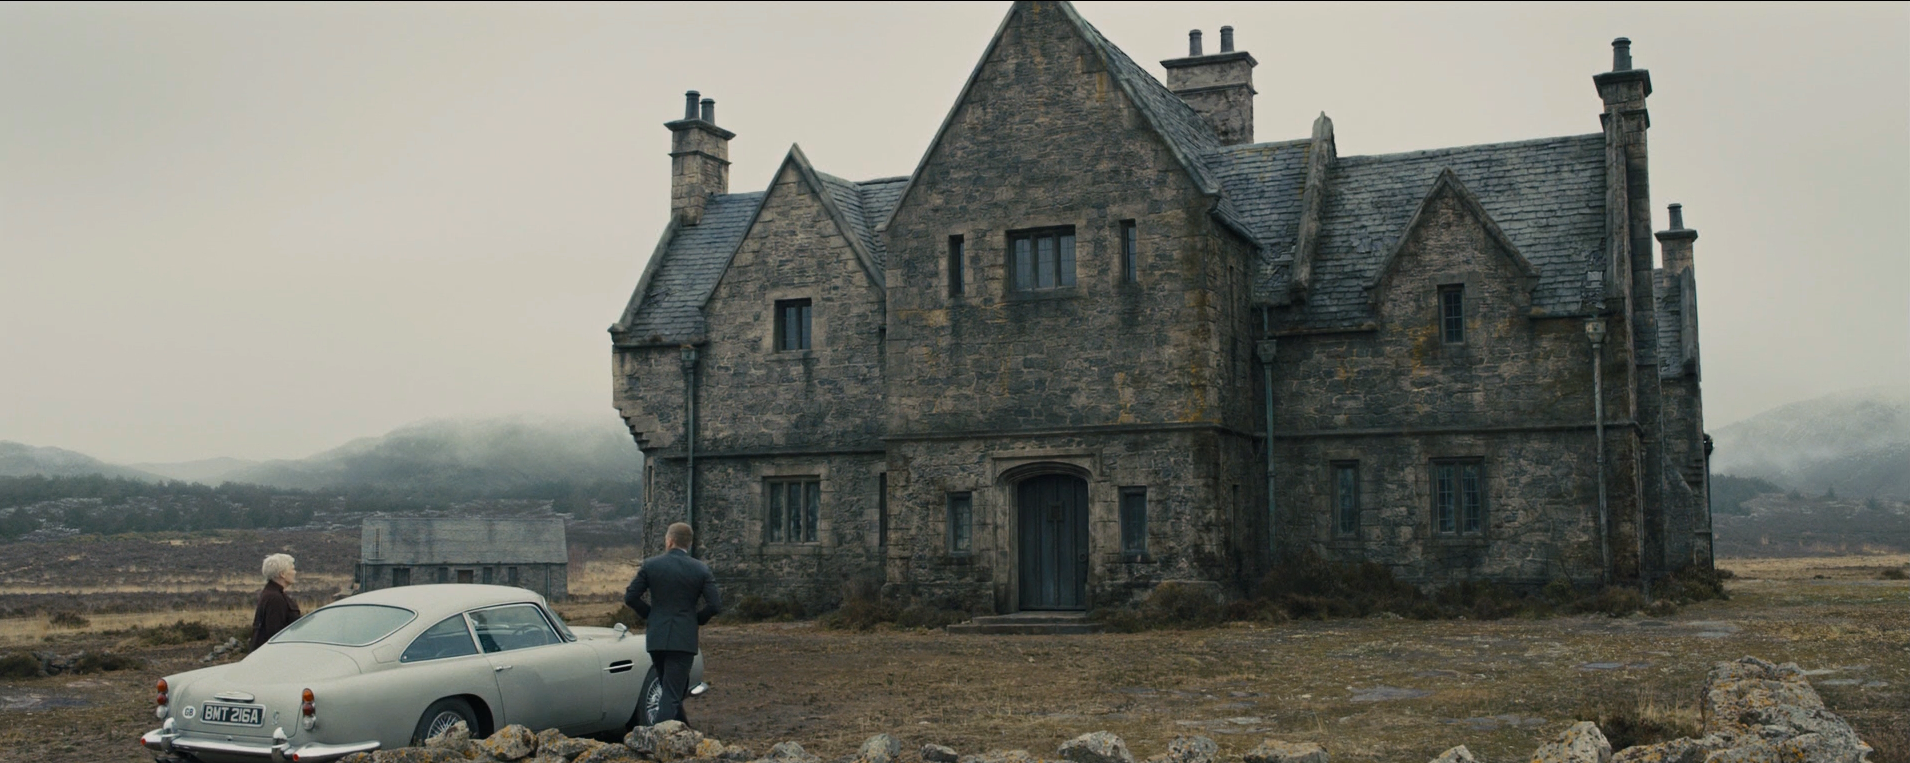 Skyfall James Bond's estate